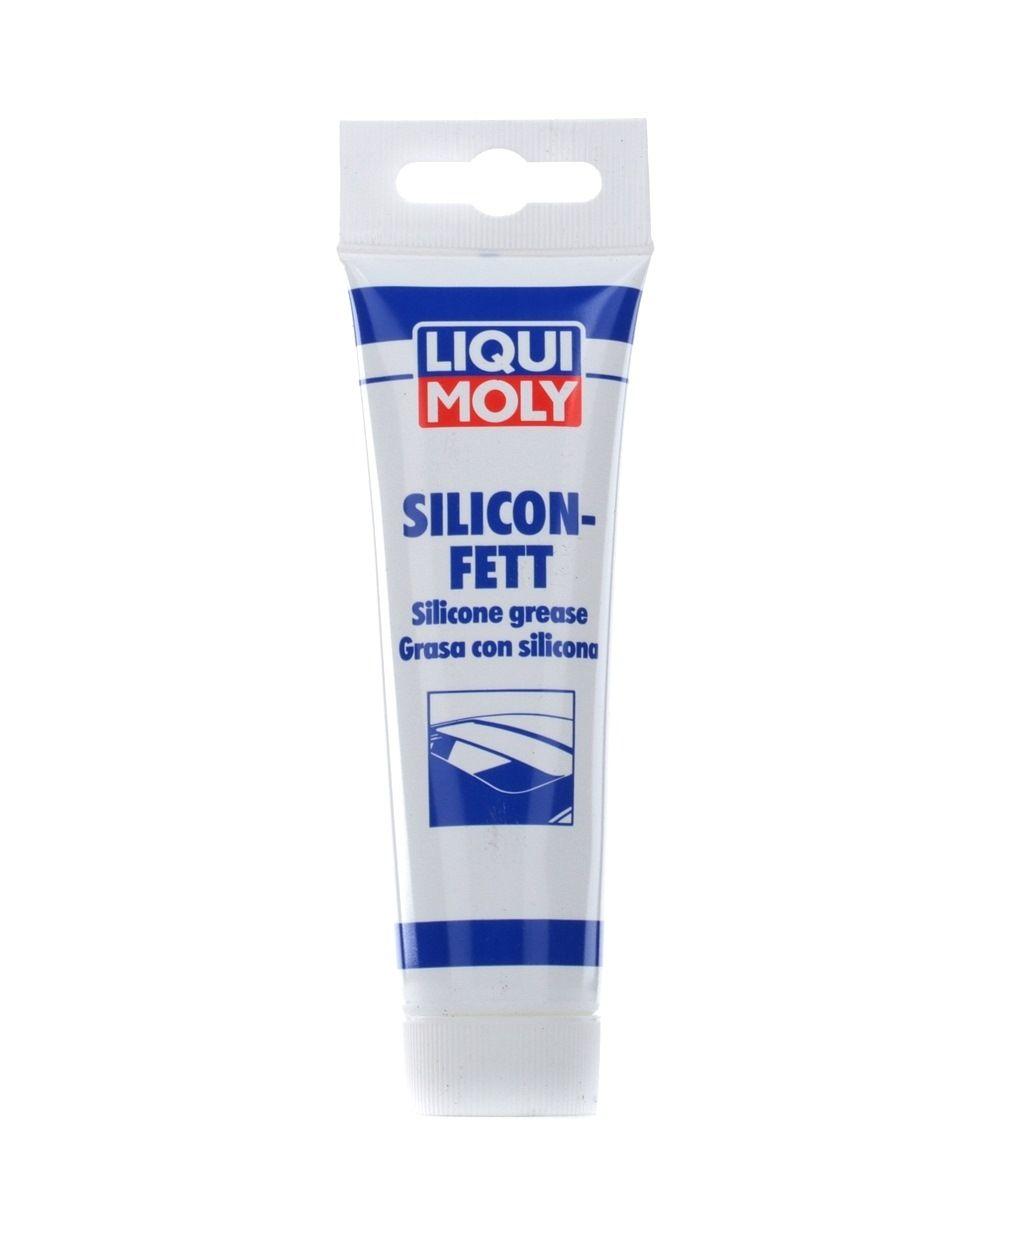 Silikonschmierstoff LIQUI MOLY P000364 Bewertung